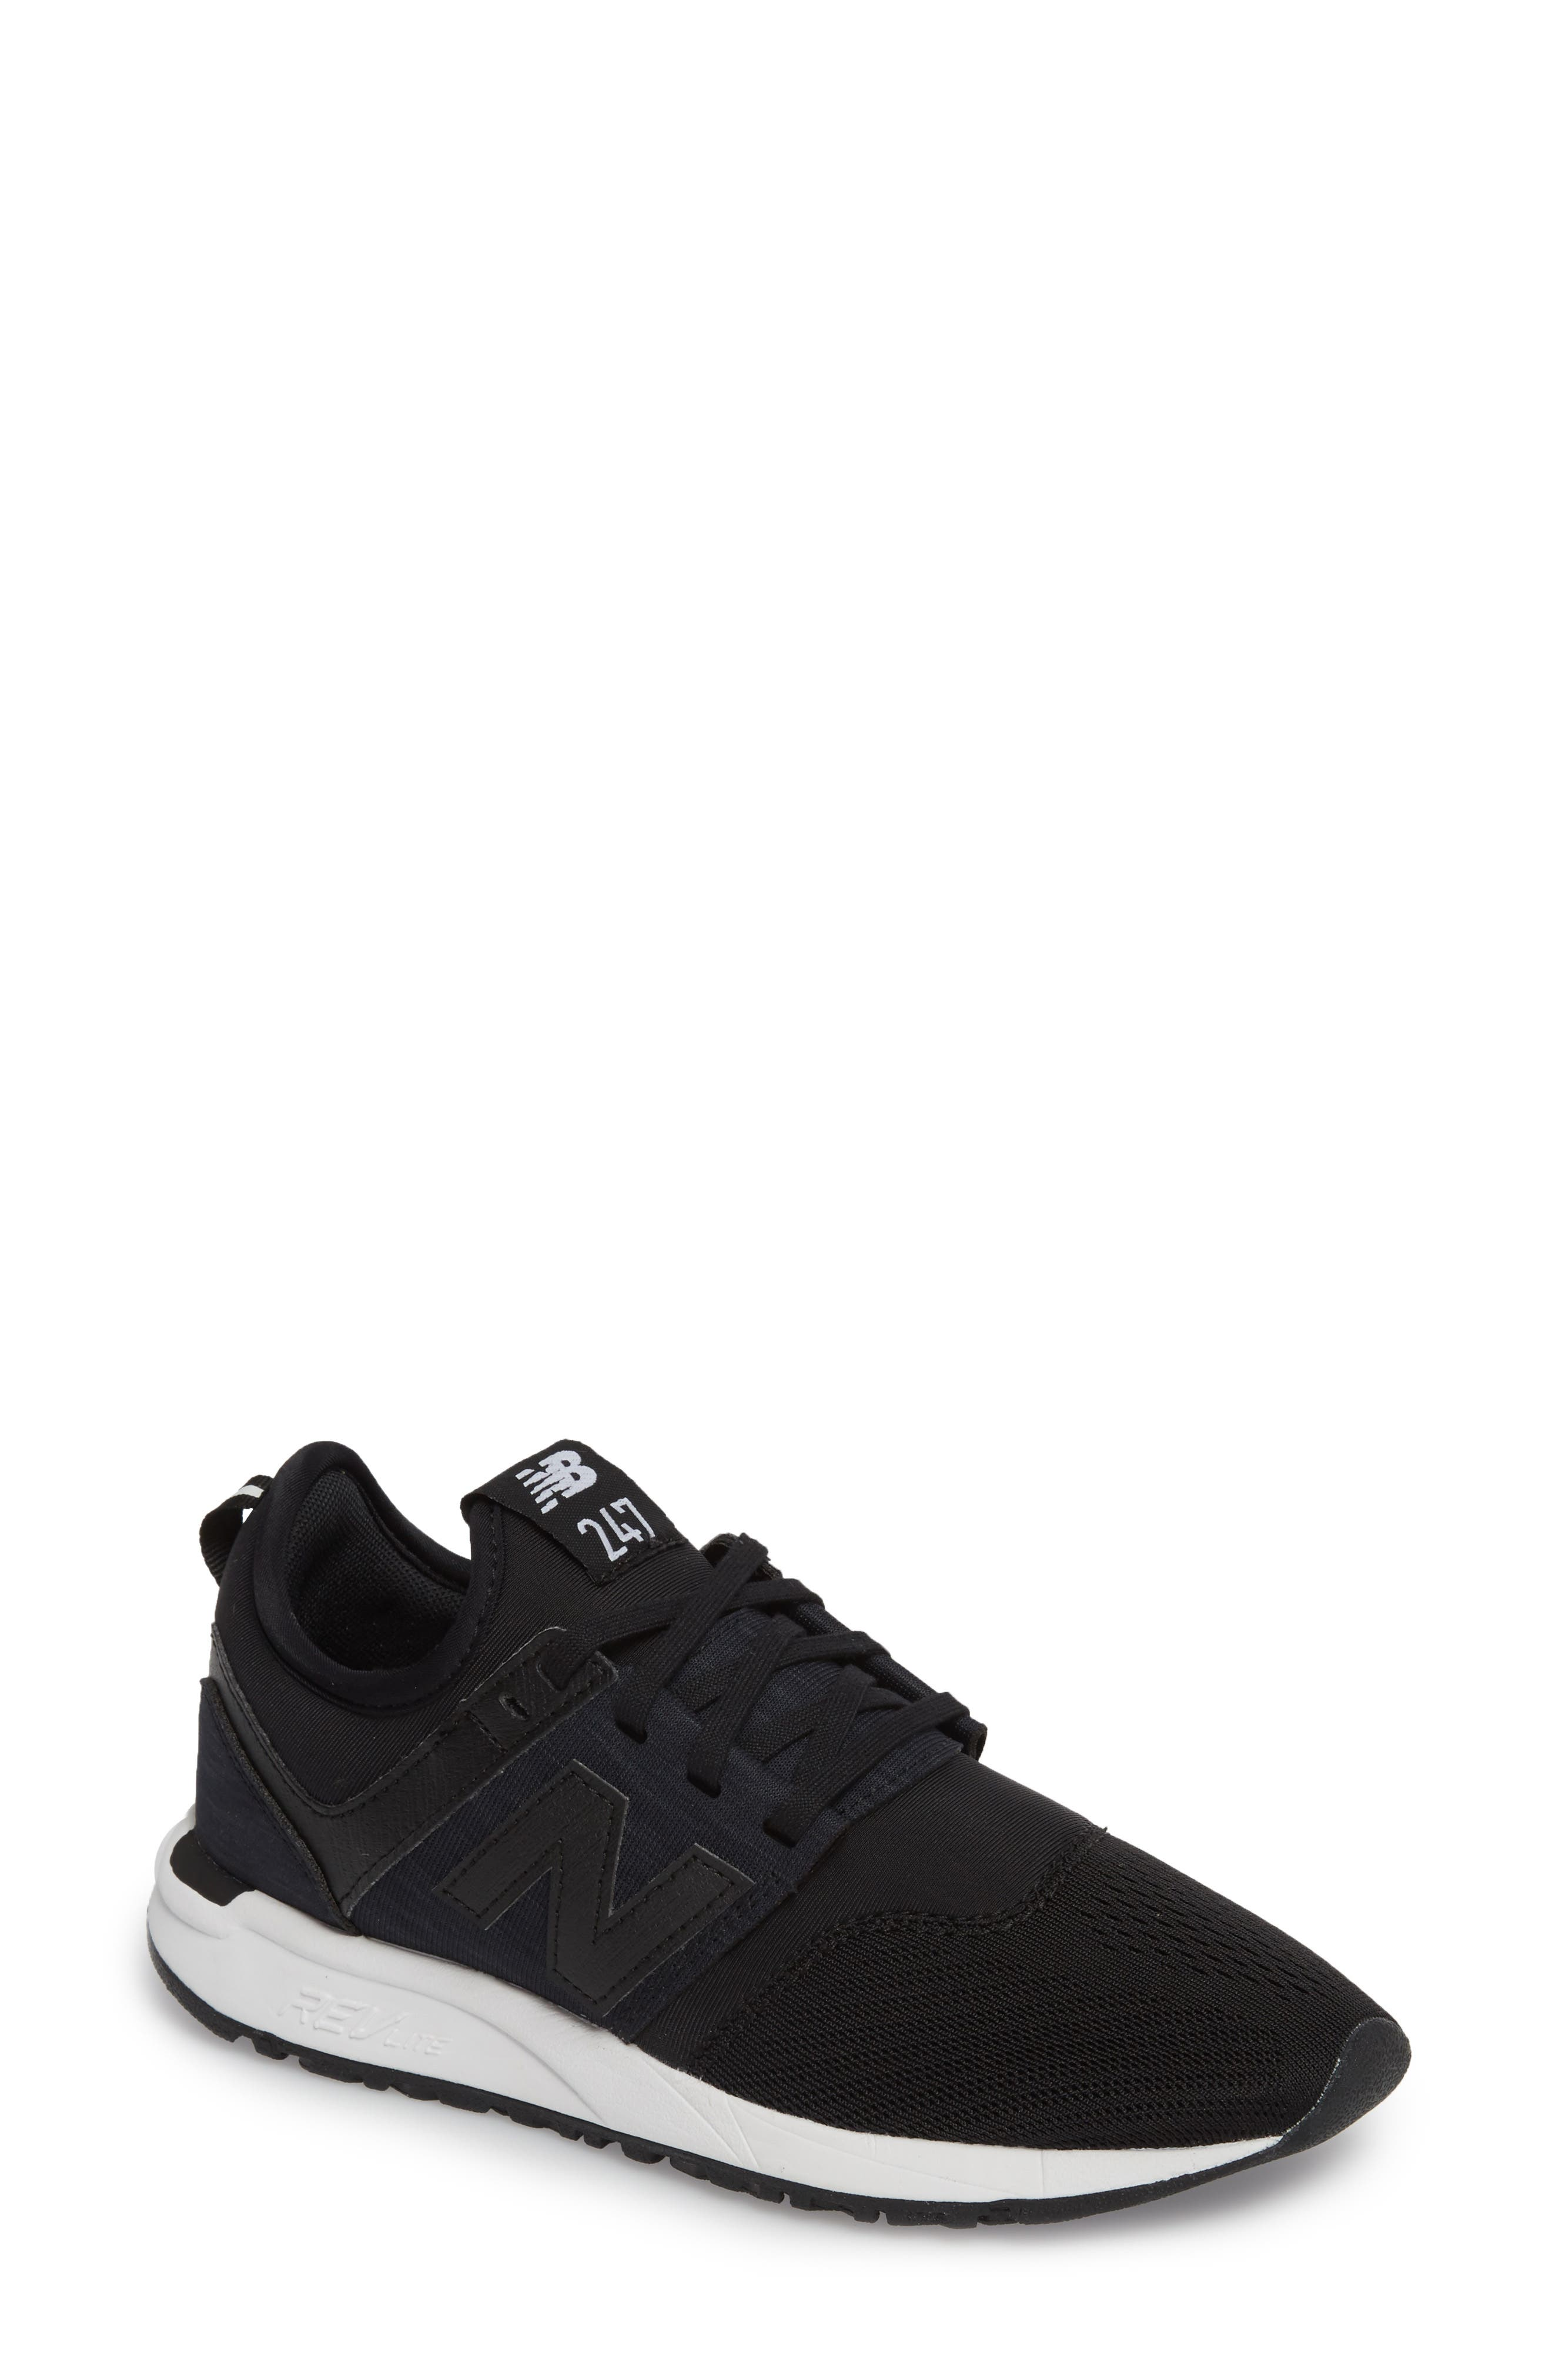 247 Classic Sneaker,                         Main,                         color, Black